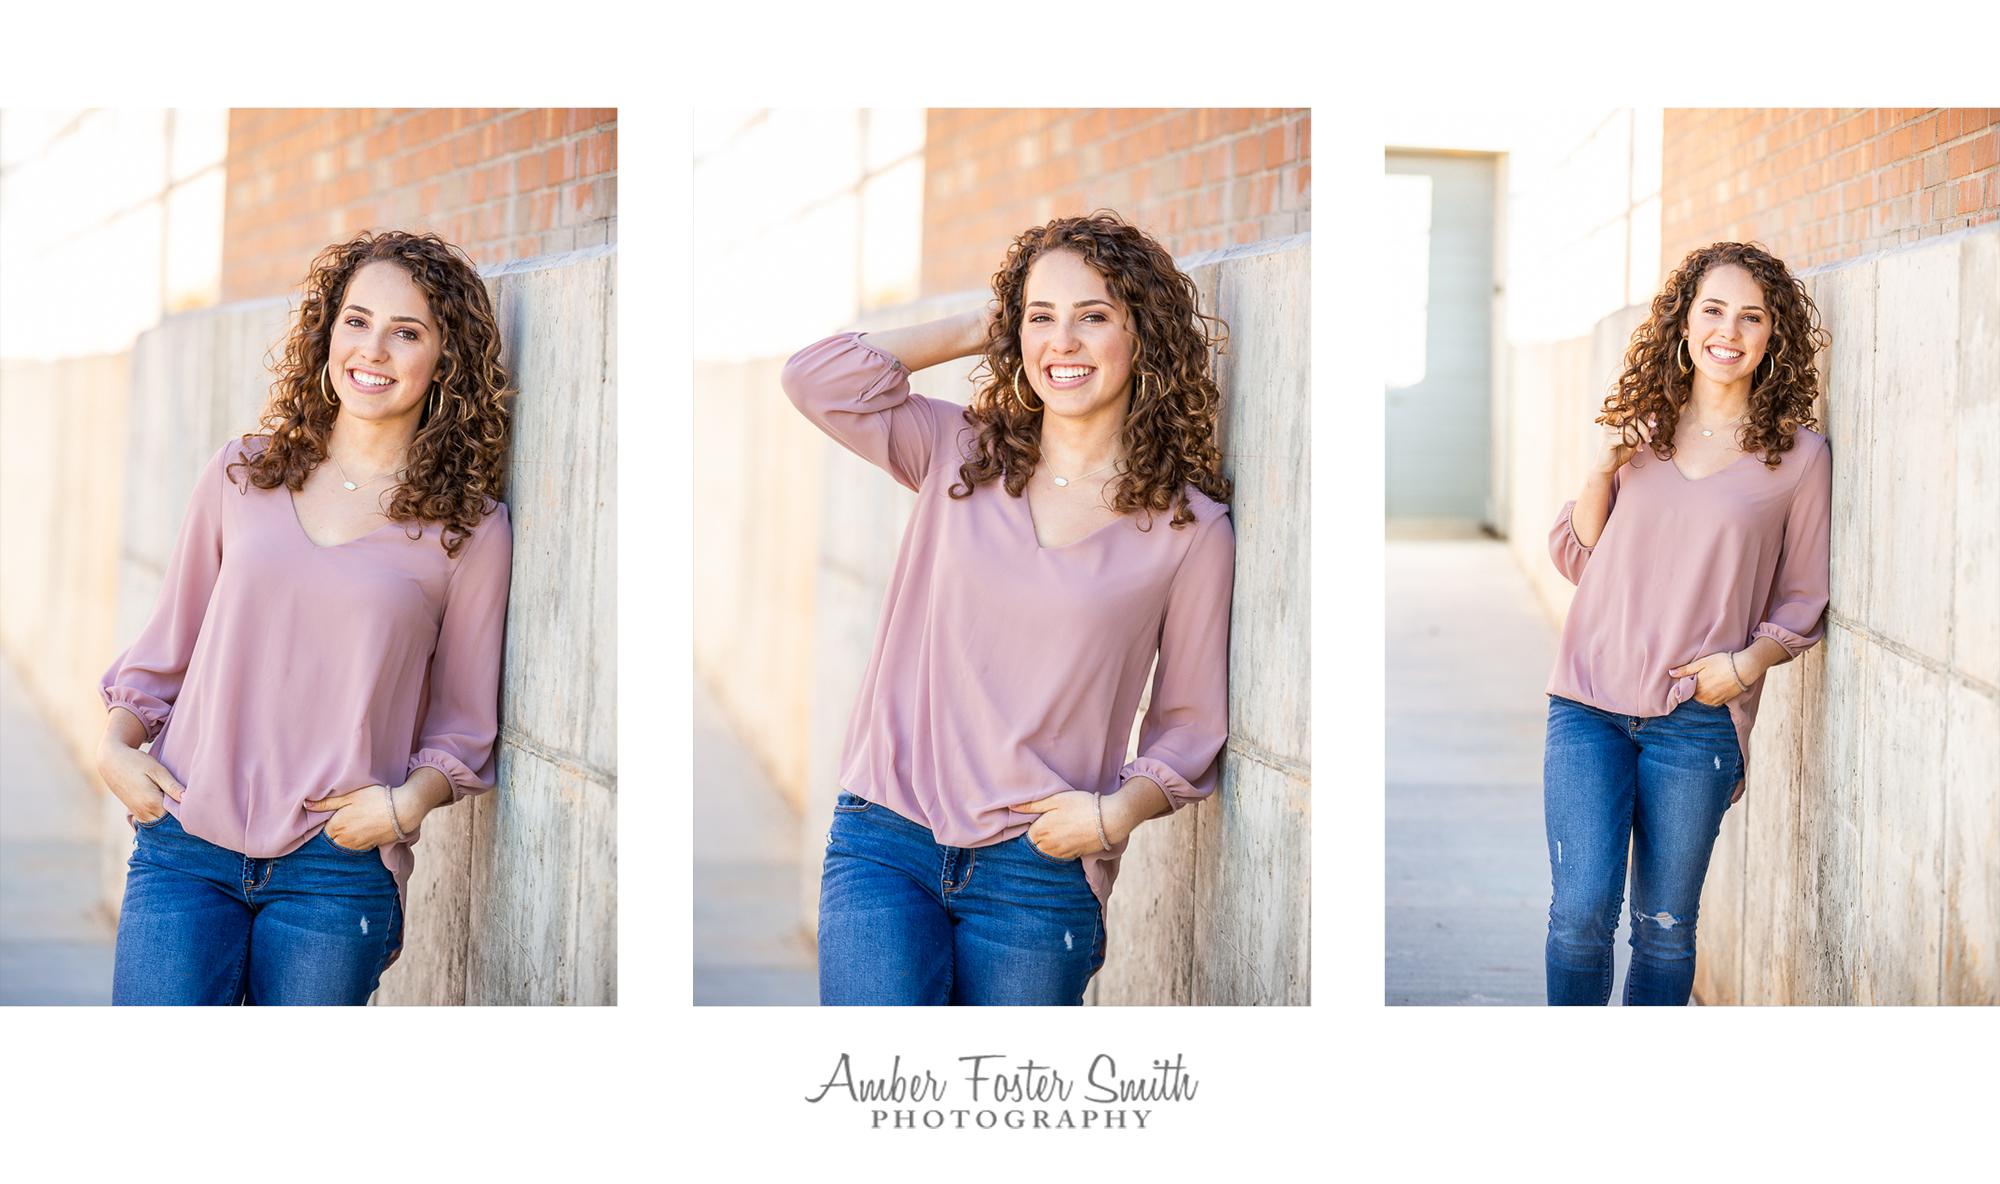 Amber Foster Smith Photography - Raleigh High School Senior Photography